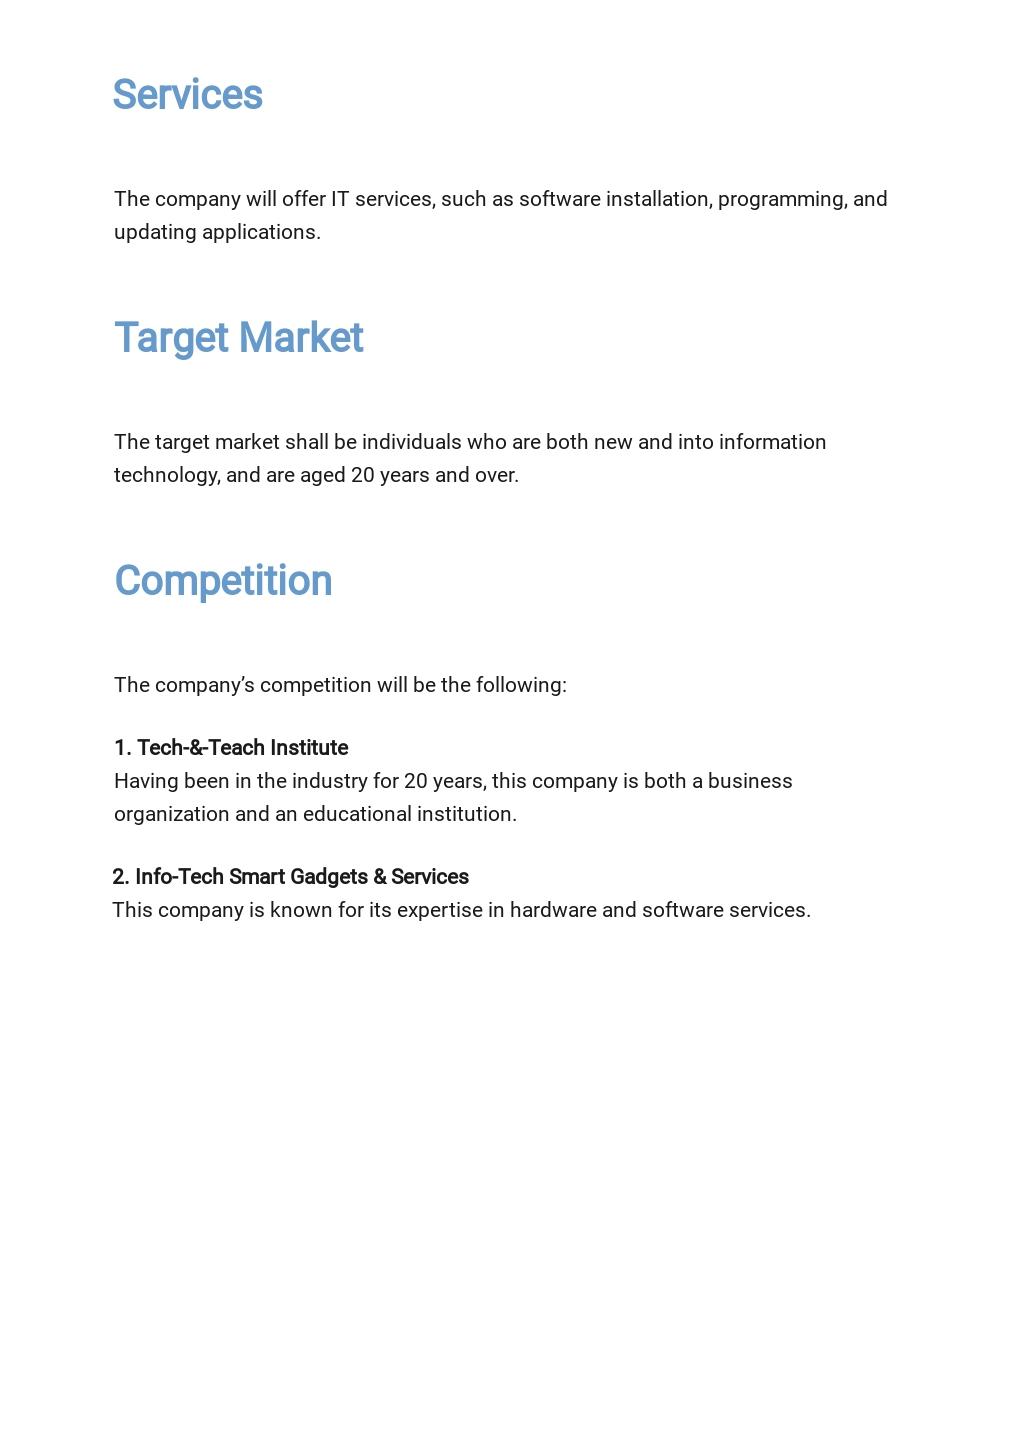 Free Sample Information Technology Business Plan Template 2.jpe